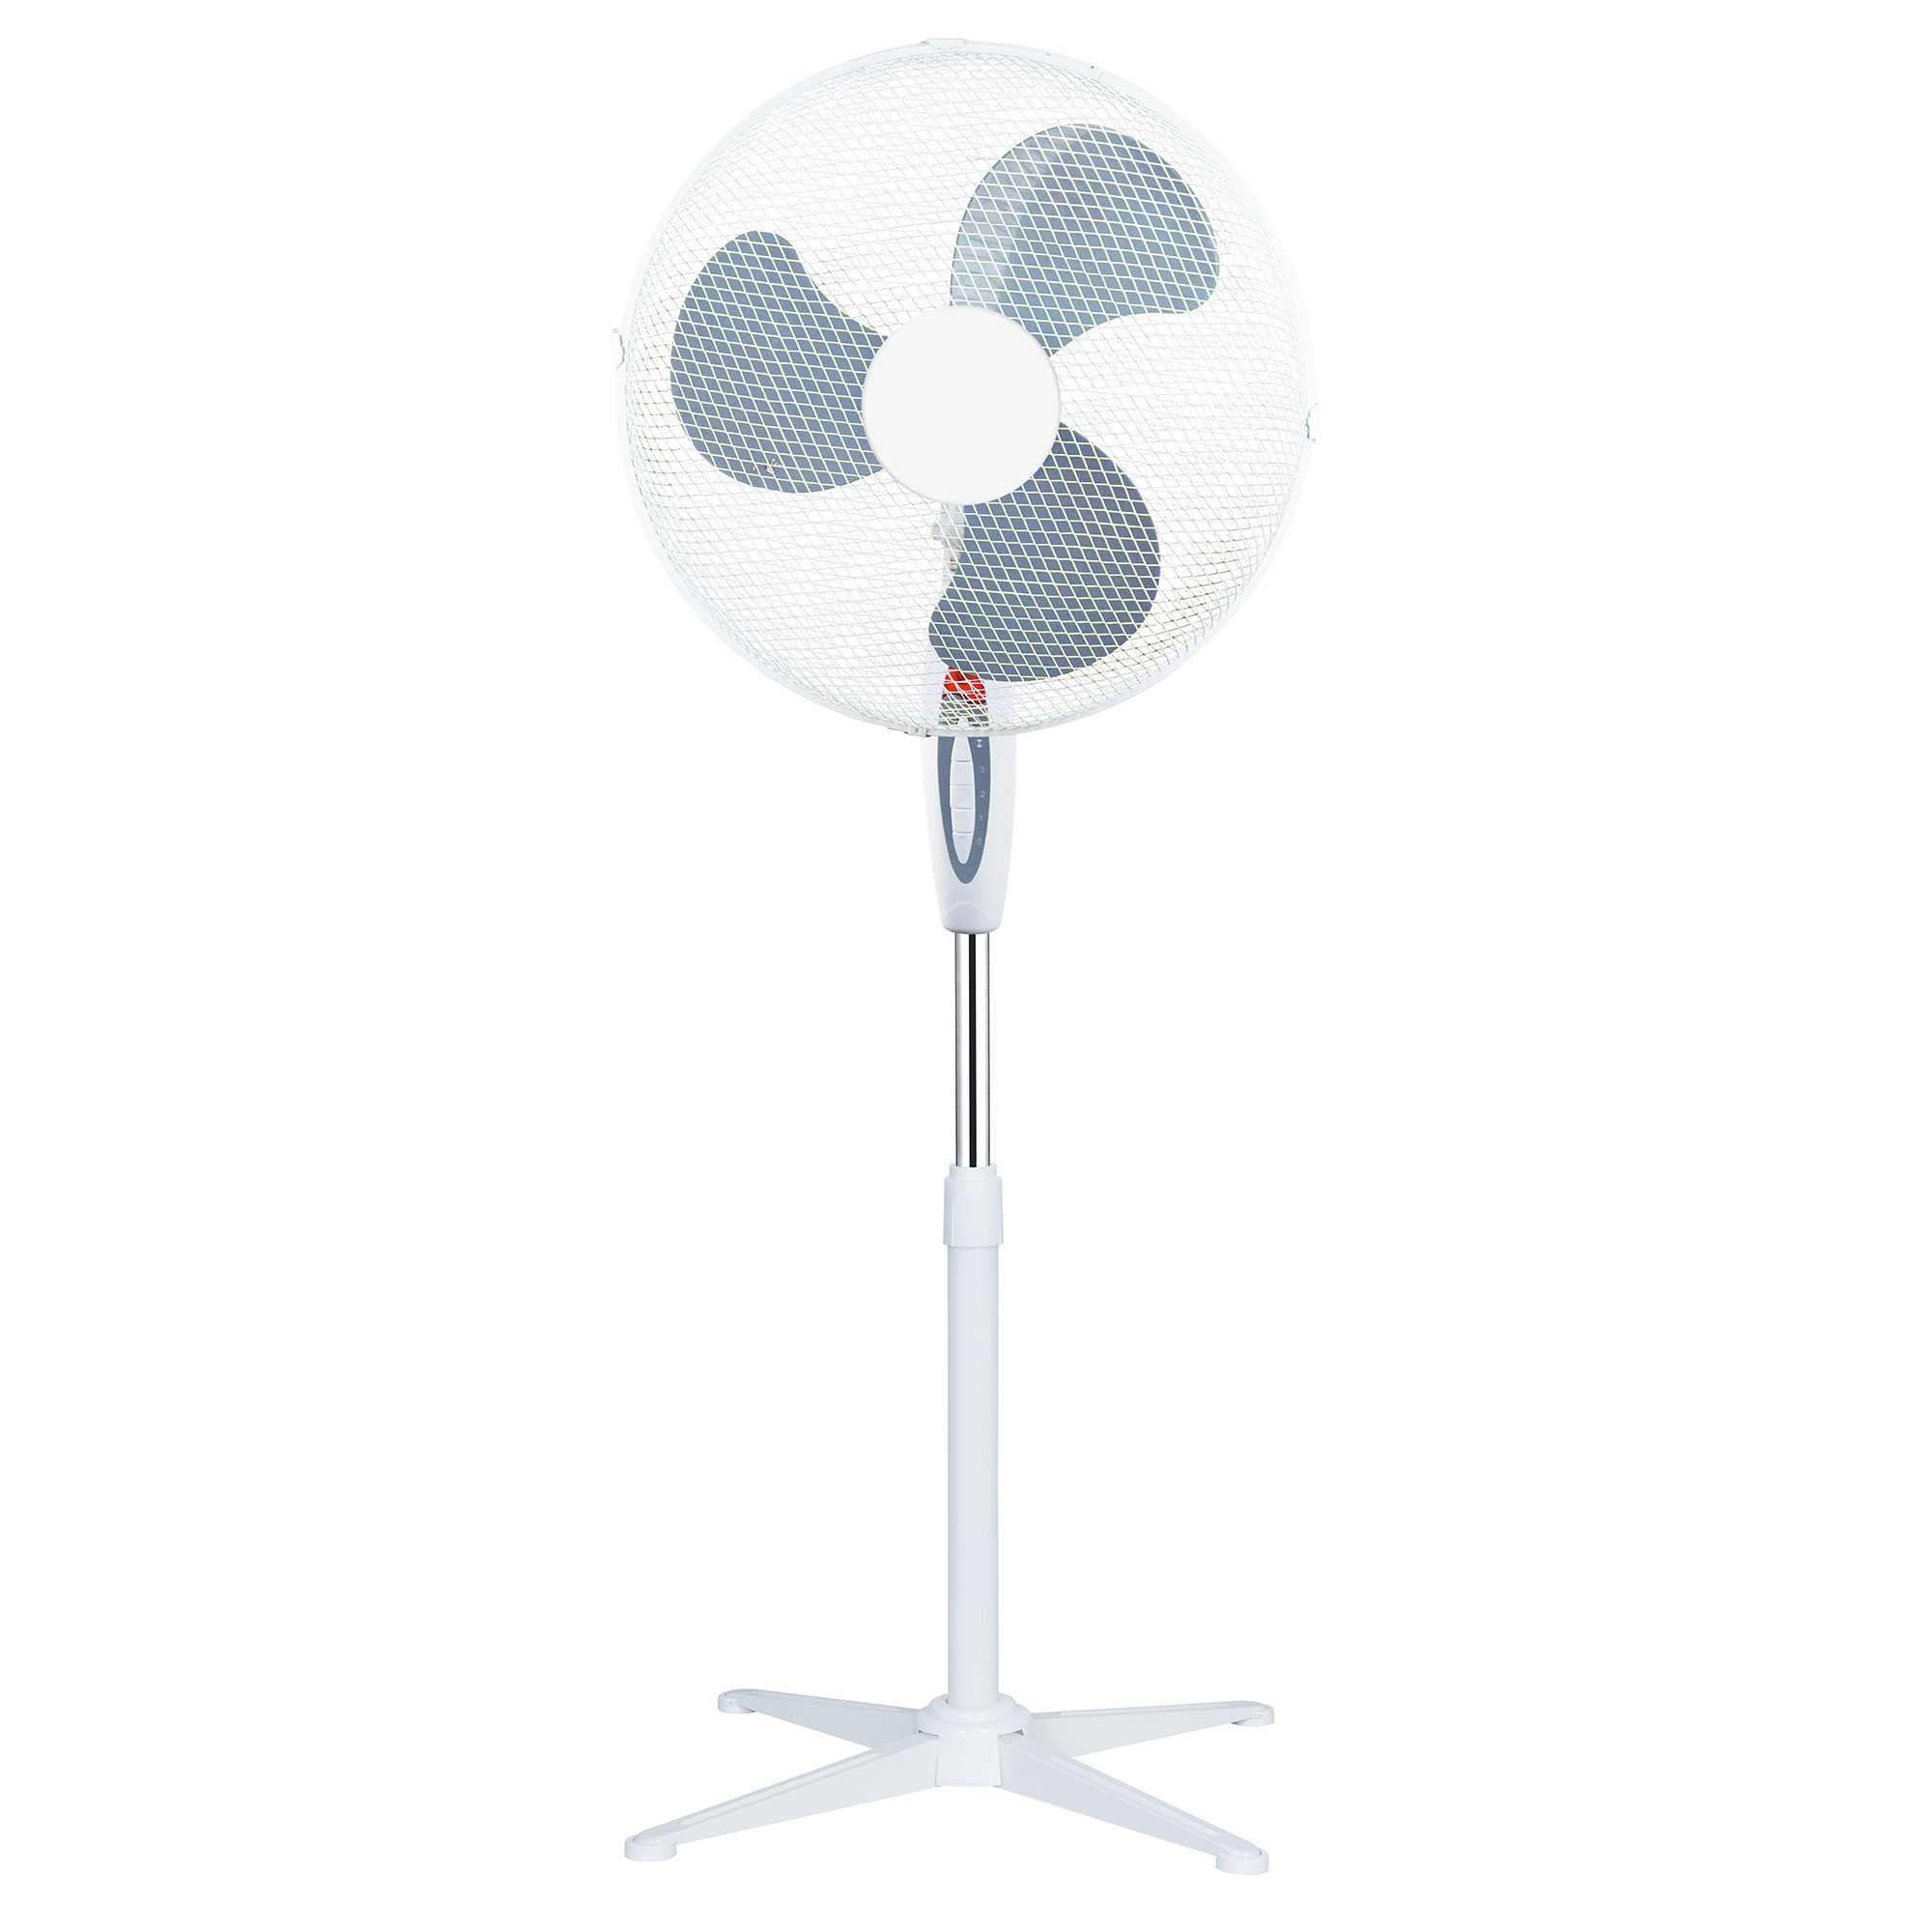 LEX Domácí ventilátor STANDVENTILATOR White